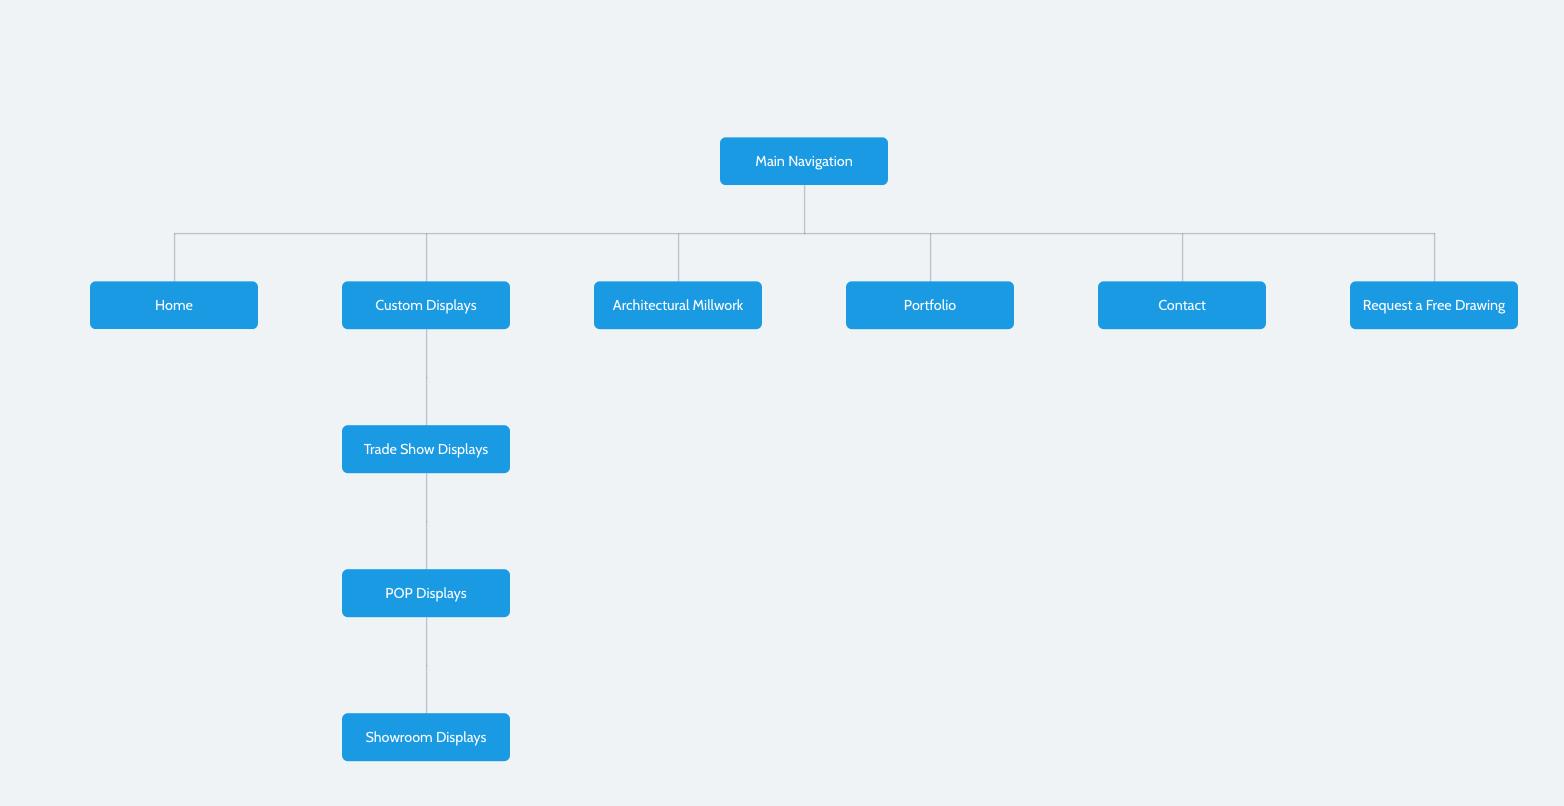 Sample Sitemap Made in MockFlow